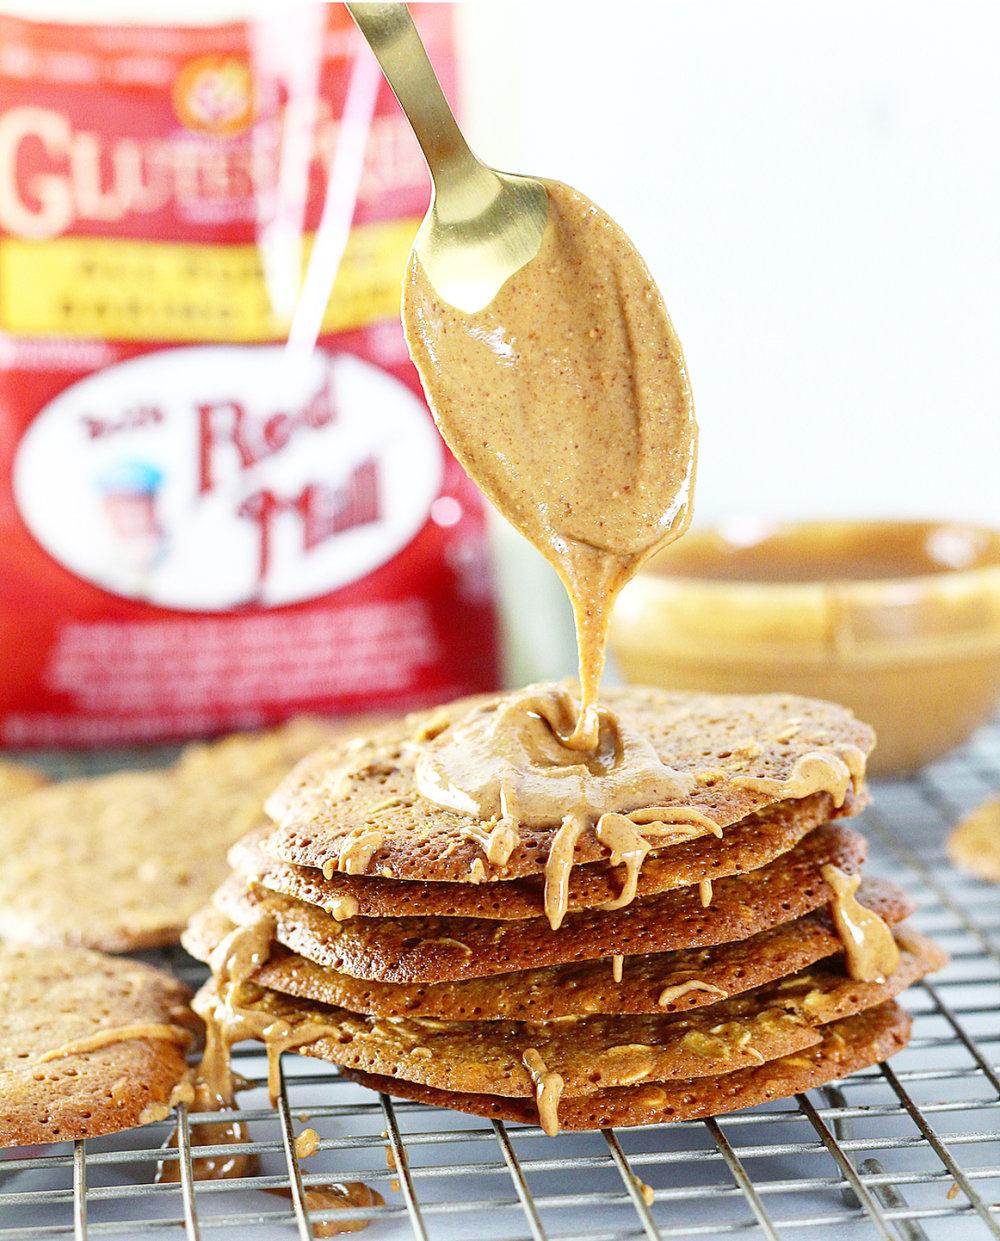 Gluten Free Oatmeal Peanut Butter Lace Cookies